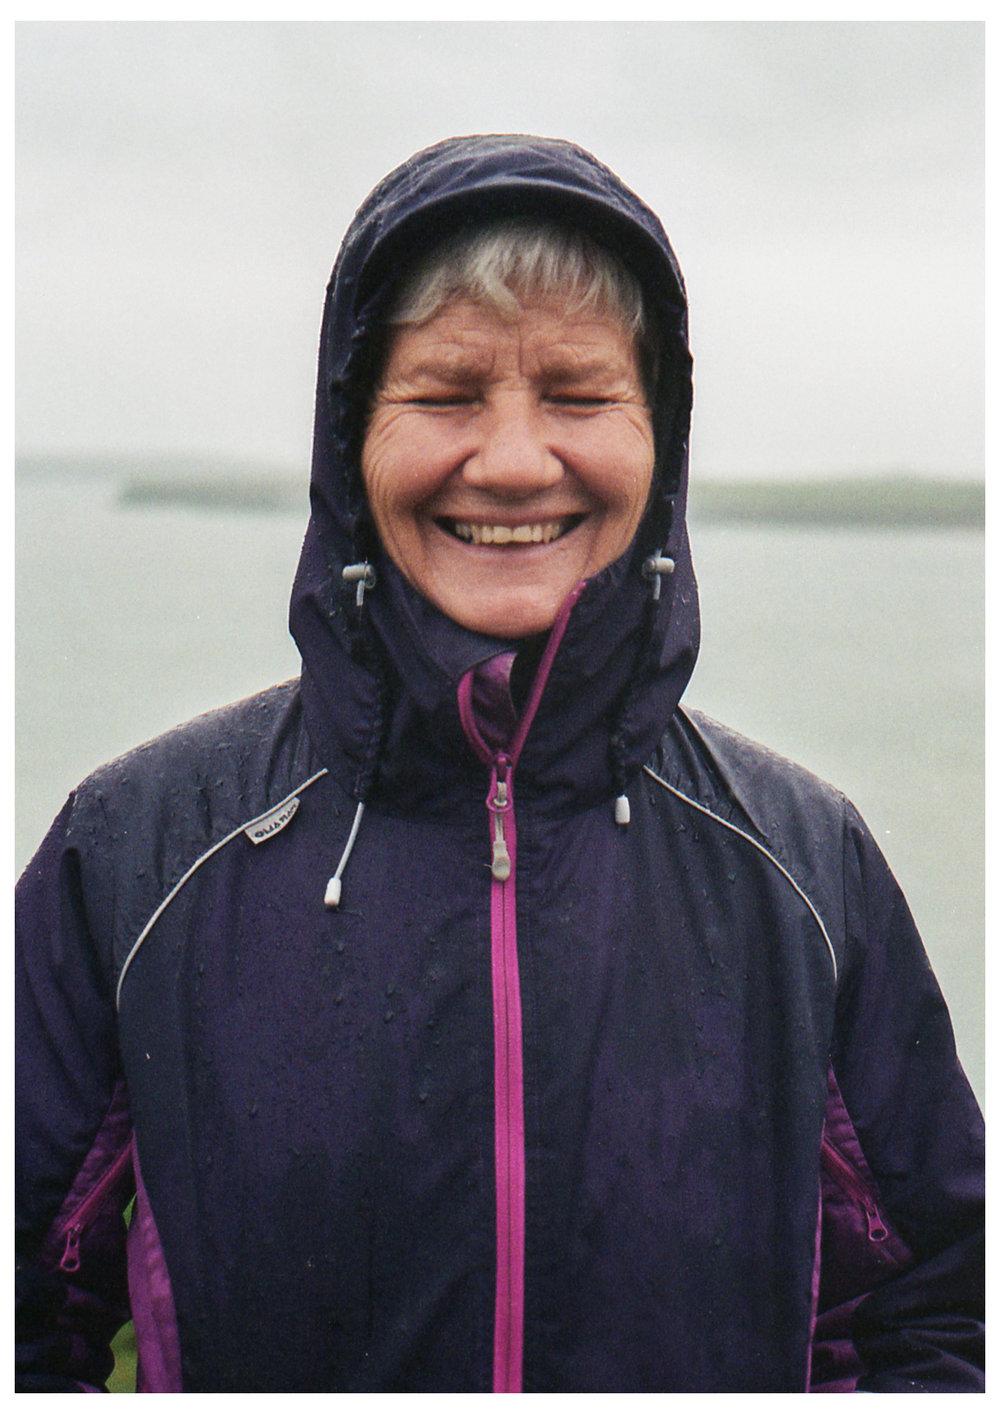 Mum Smiling.jpg